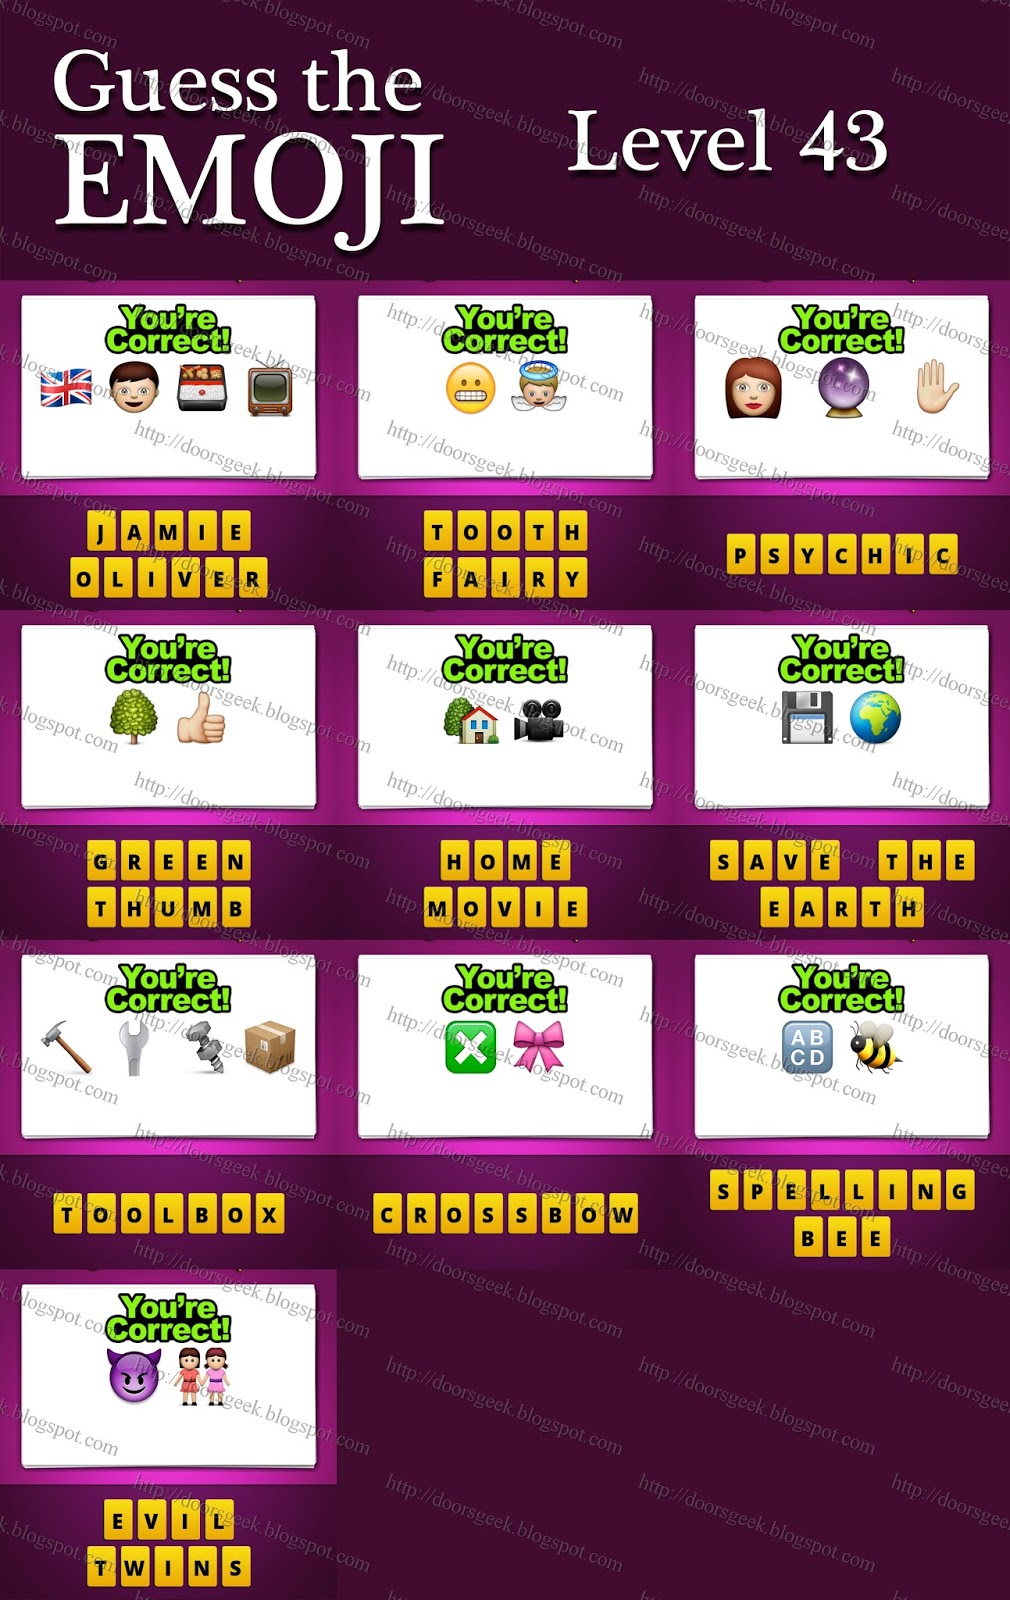 how to get gun emoji back